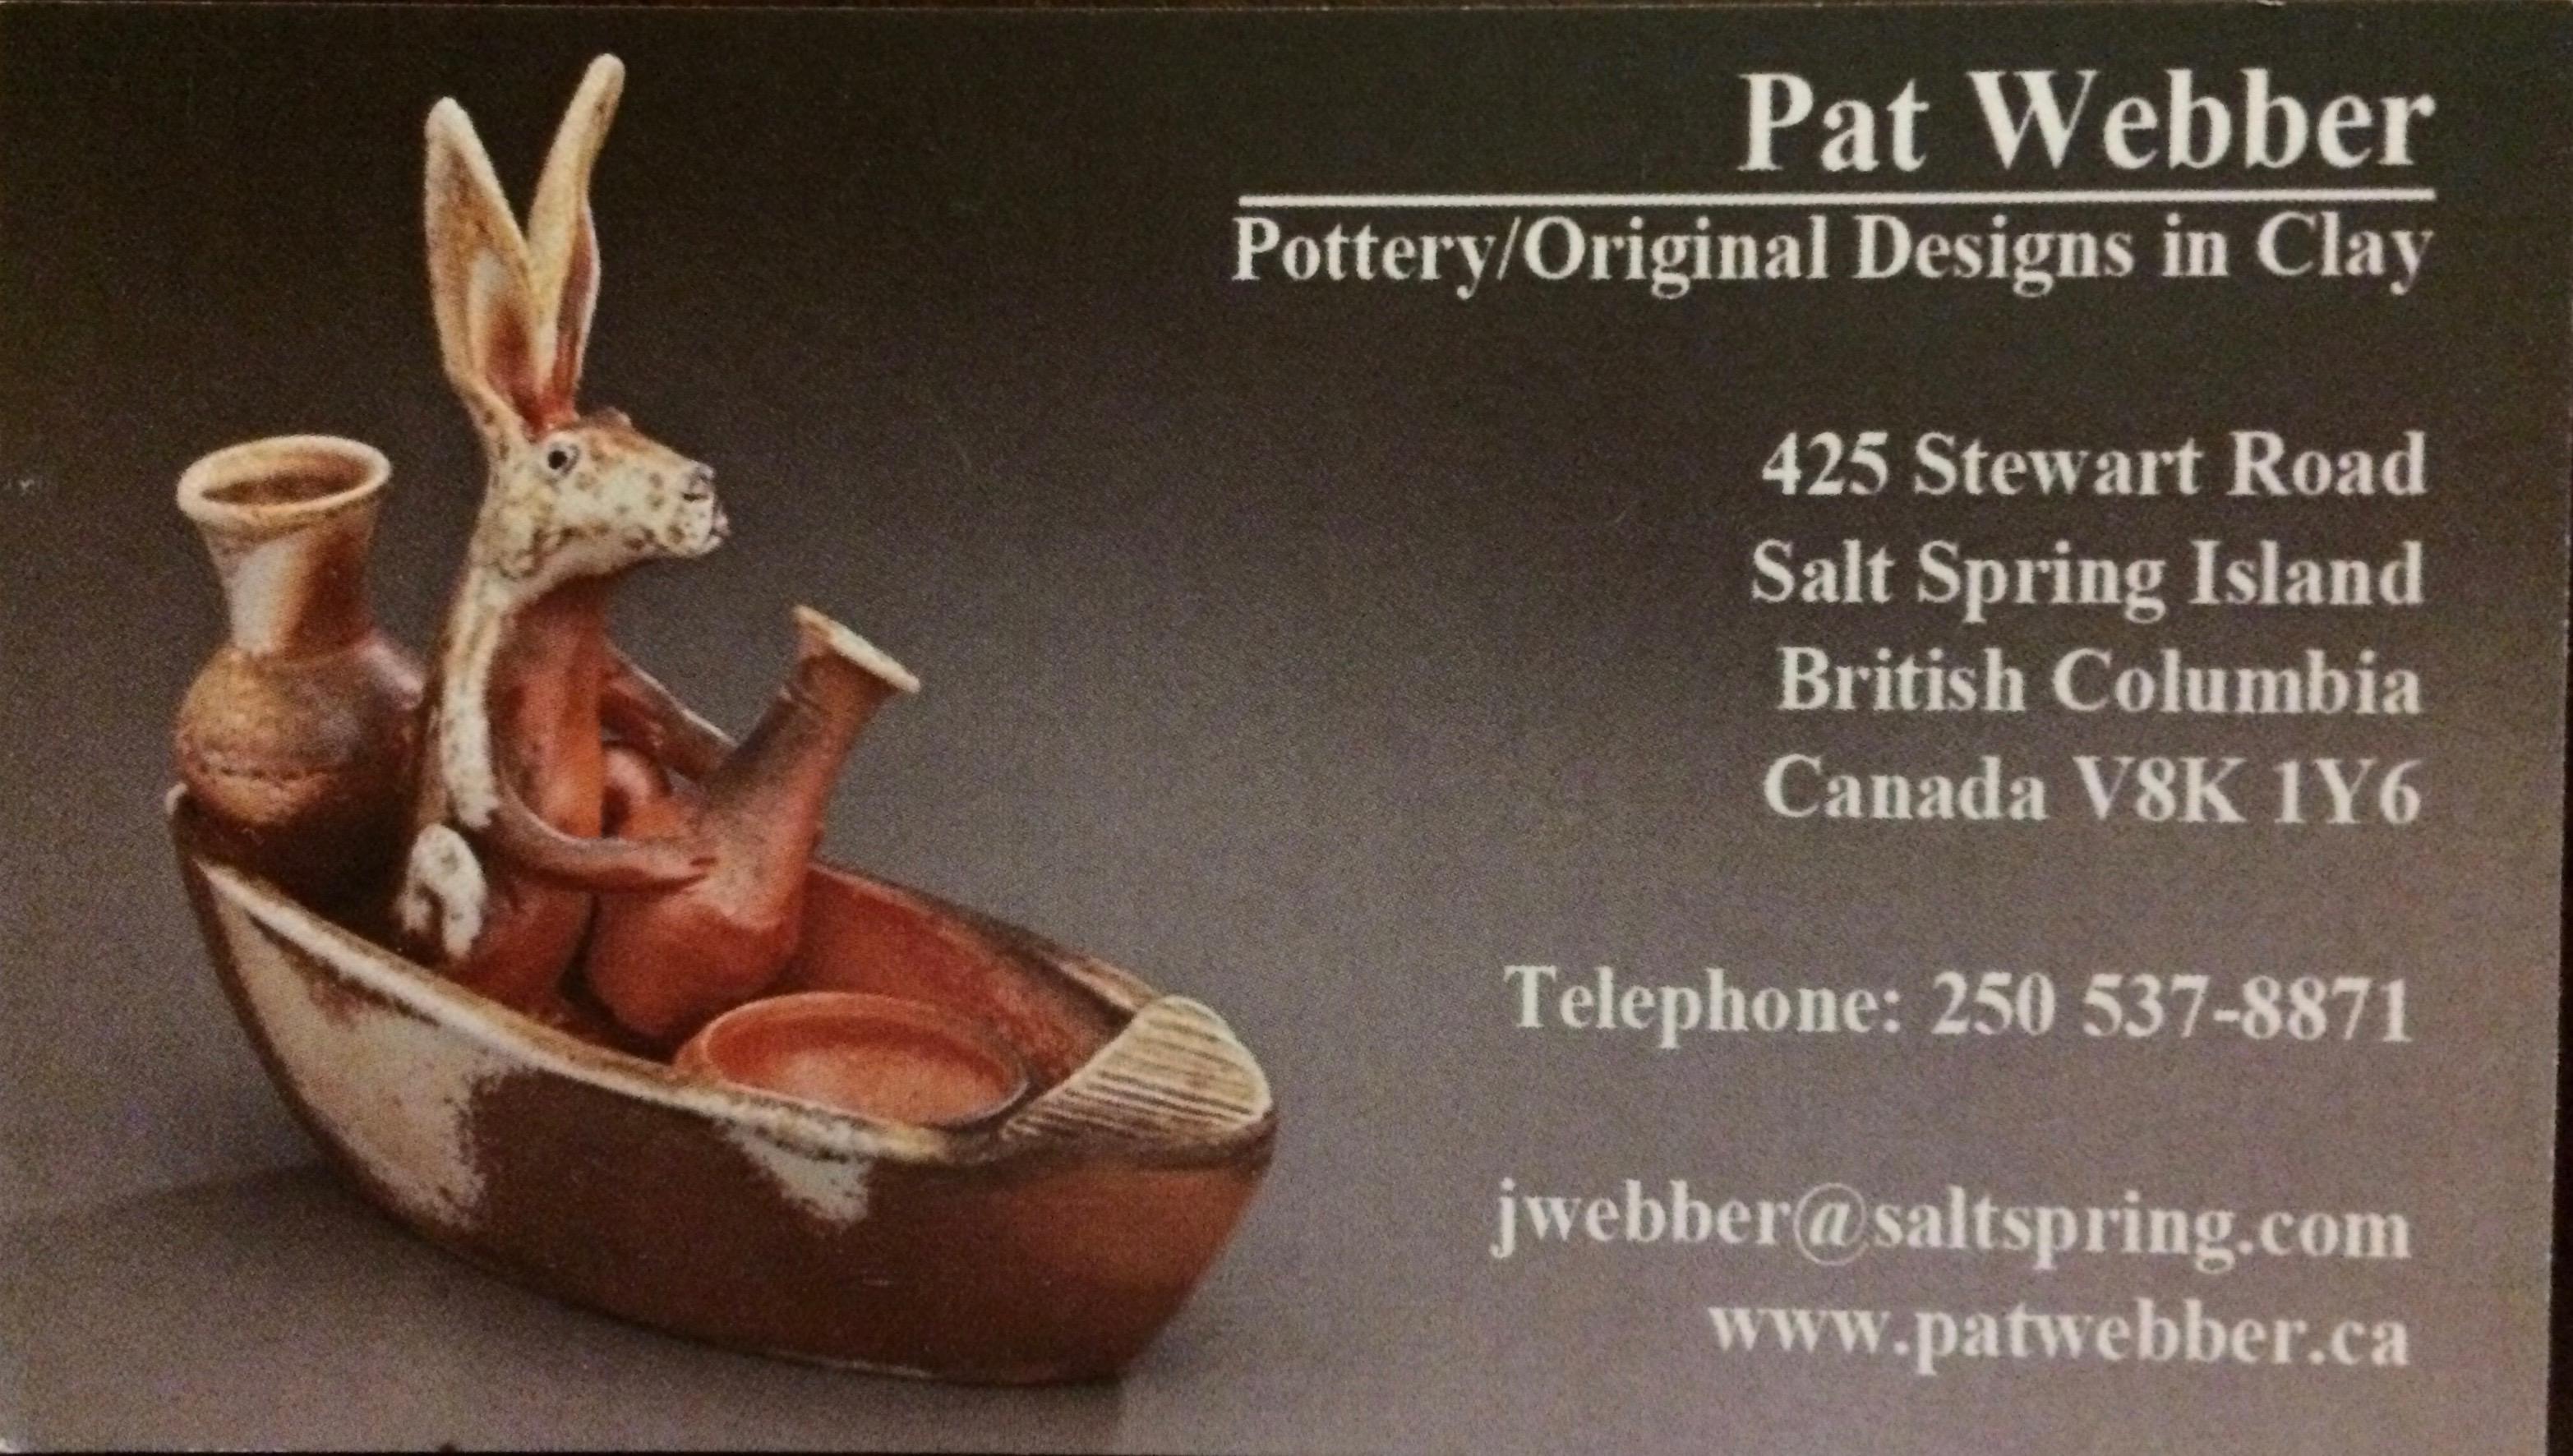 Pat Webber